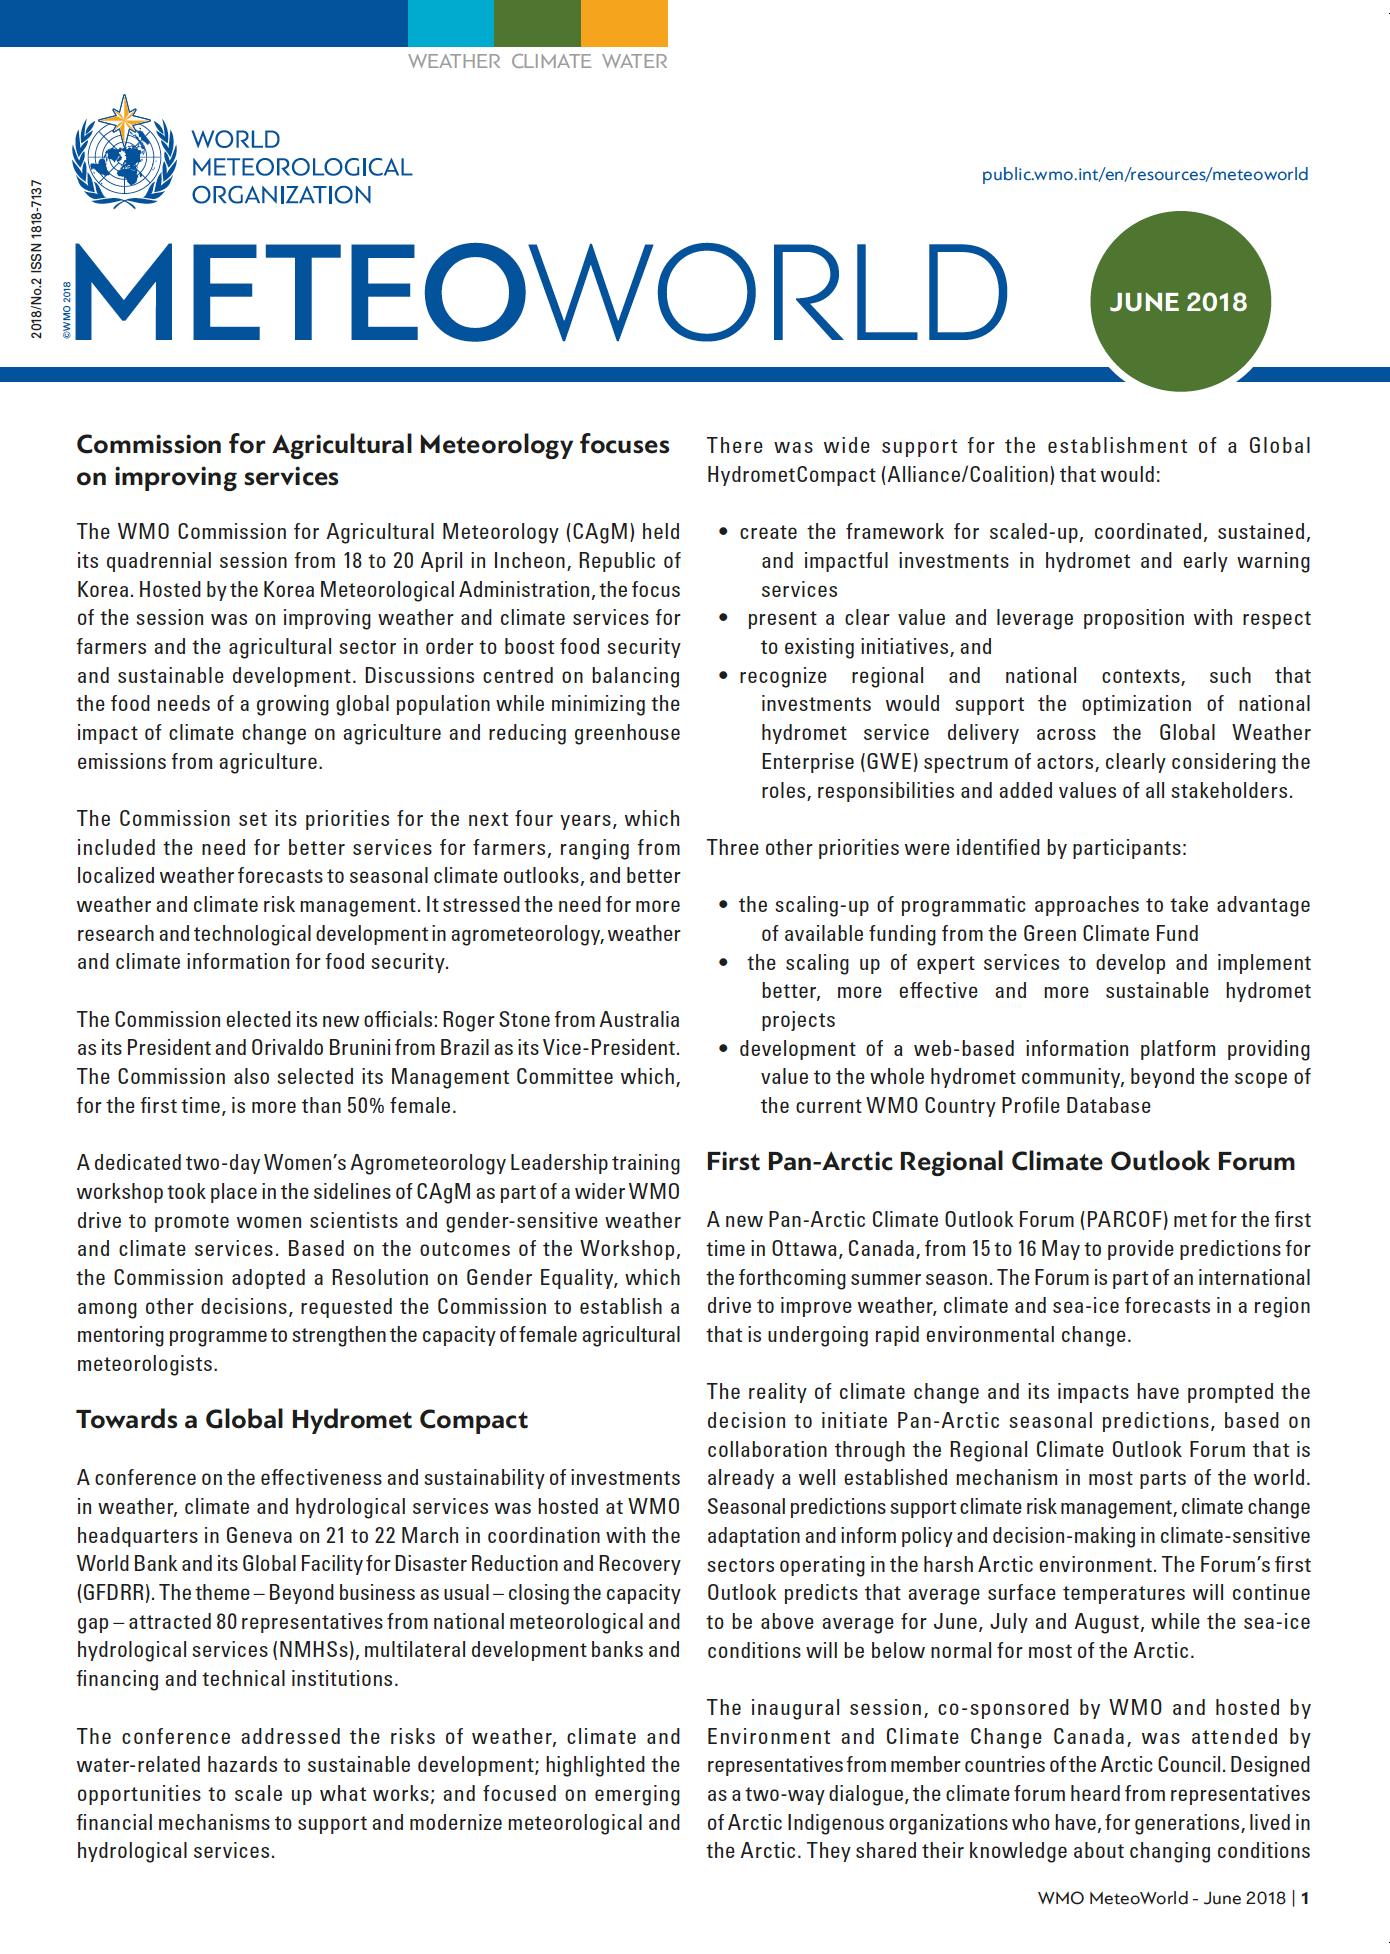 MeteoWorld June 2018 Cover